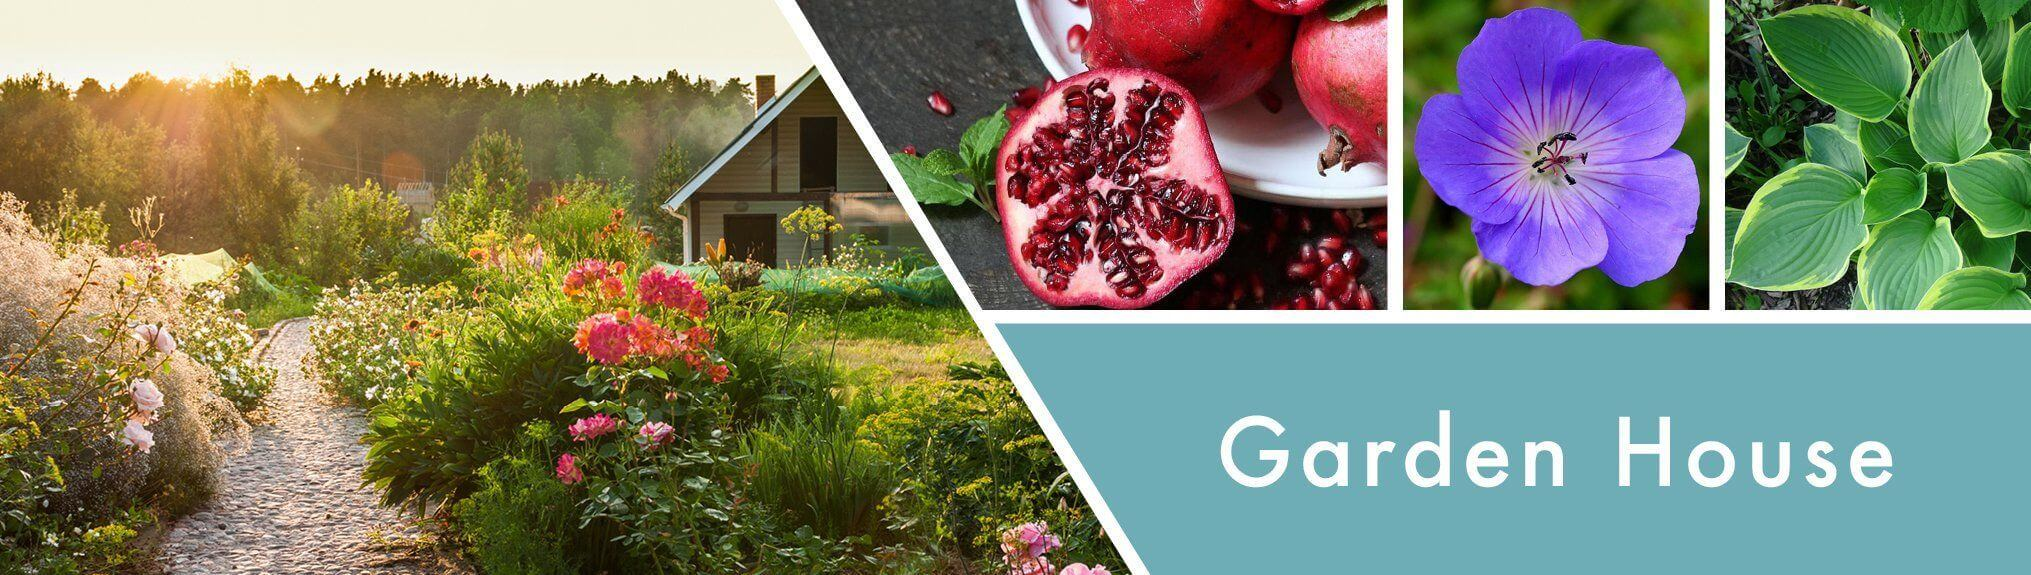 Goose-Creek-Candle-Garden-House-Duftbeschreibung